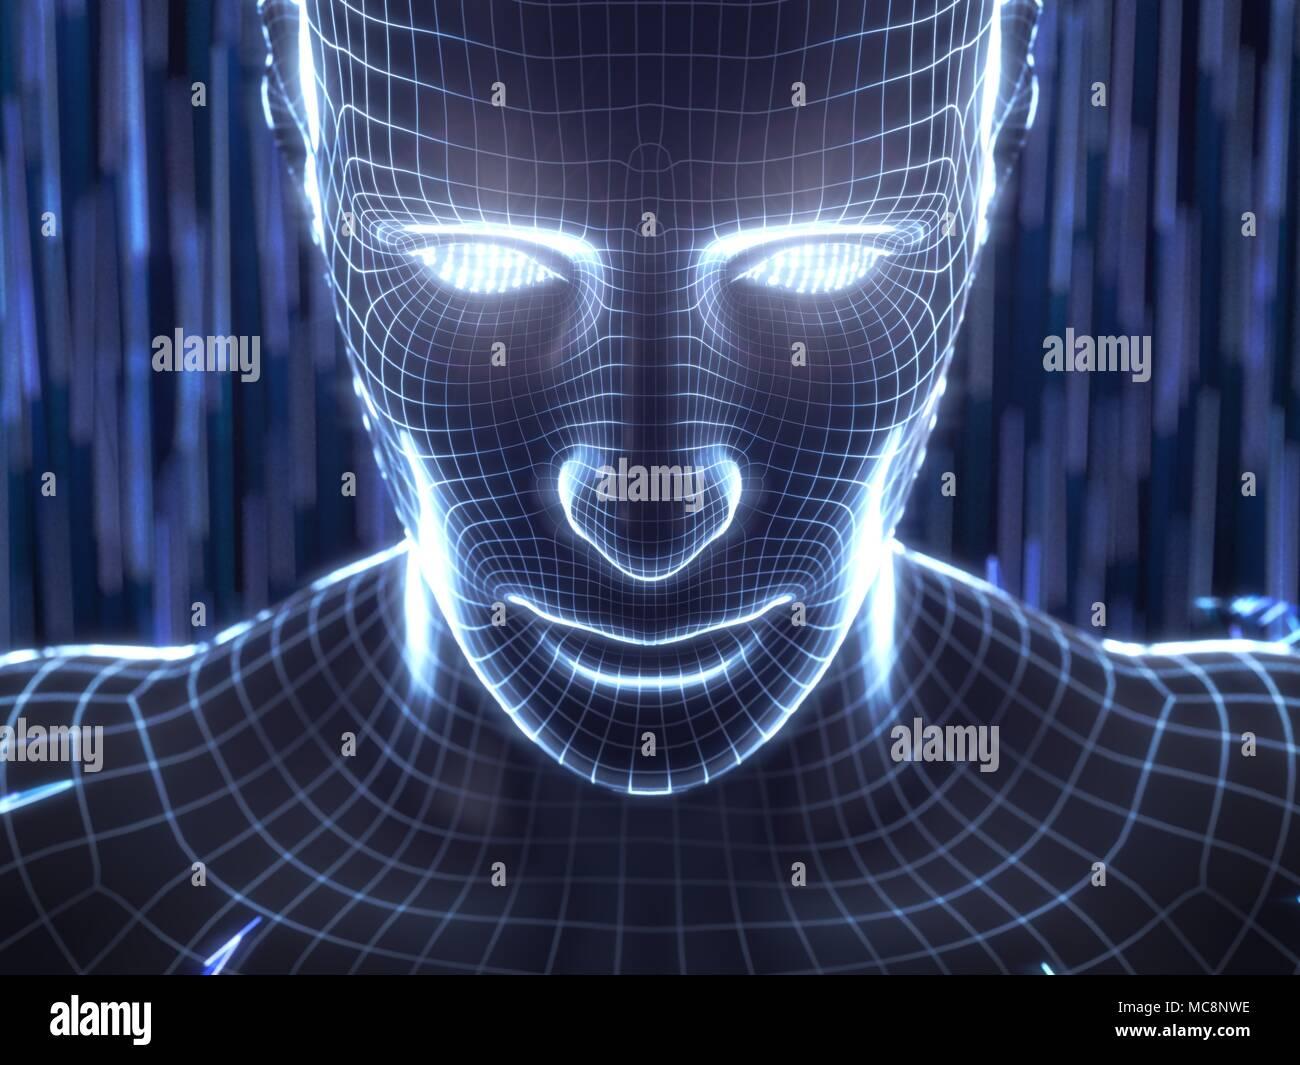 Concepto de inteligencia artificial con humano virtual avatar. Ilustración 3d. adecuado para la tecnología, la inteligencia artificial, minería de datos,profunda learnin Imagen De Stock